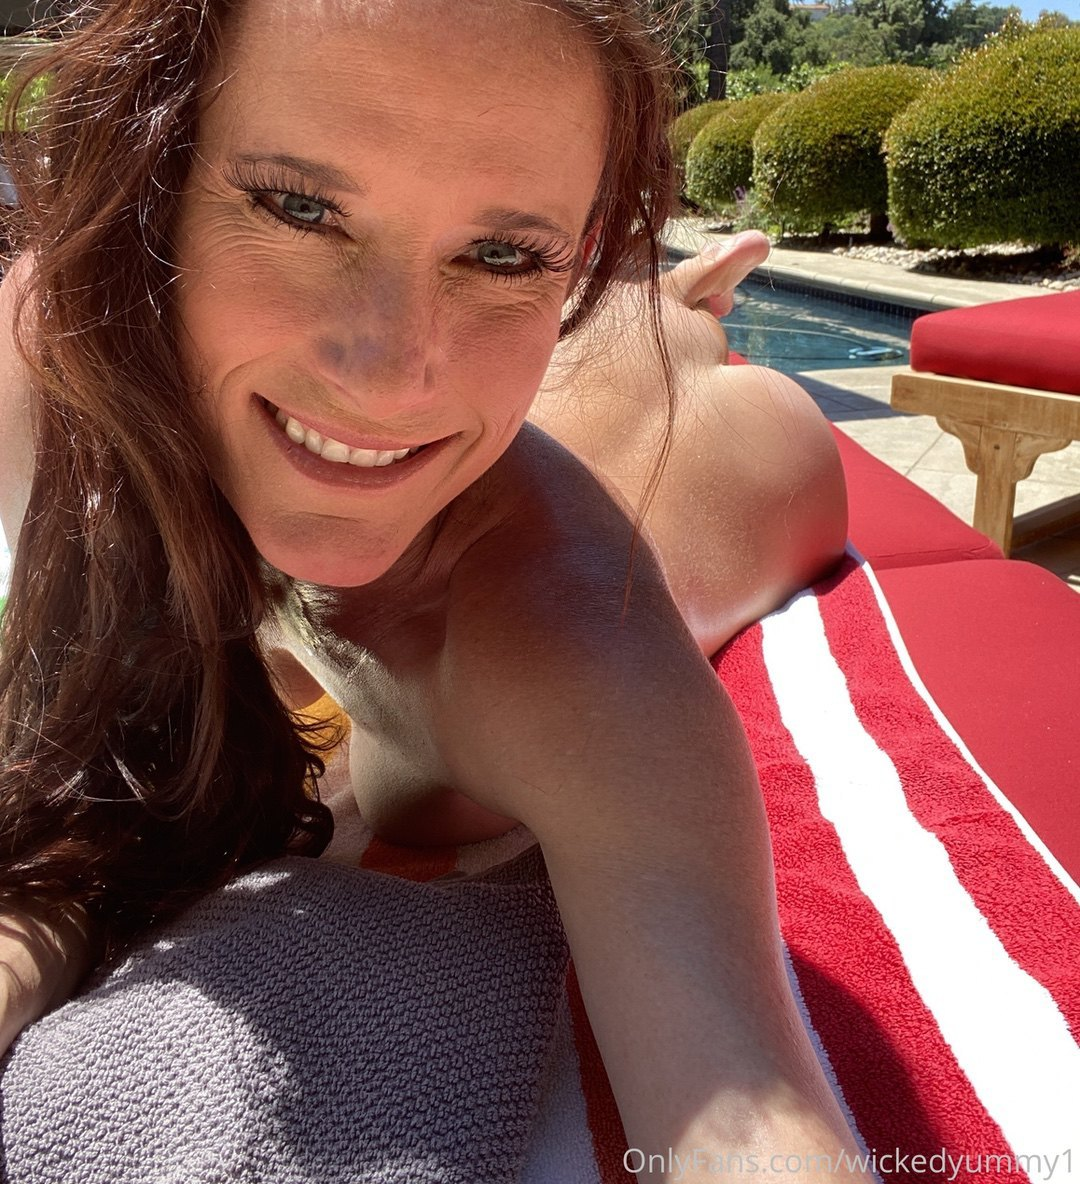 Sofie Marie Wickedyummy1 Onlyfans Nudes Leaks 0016